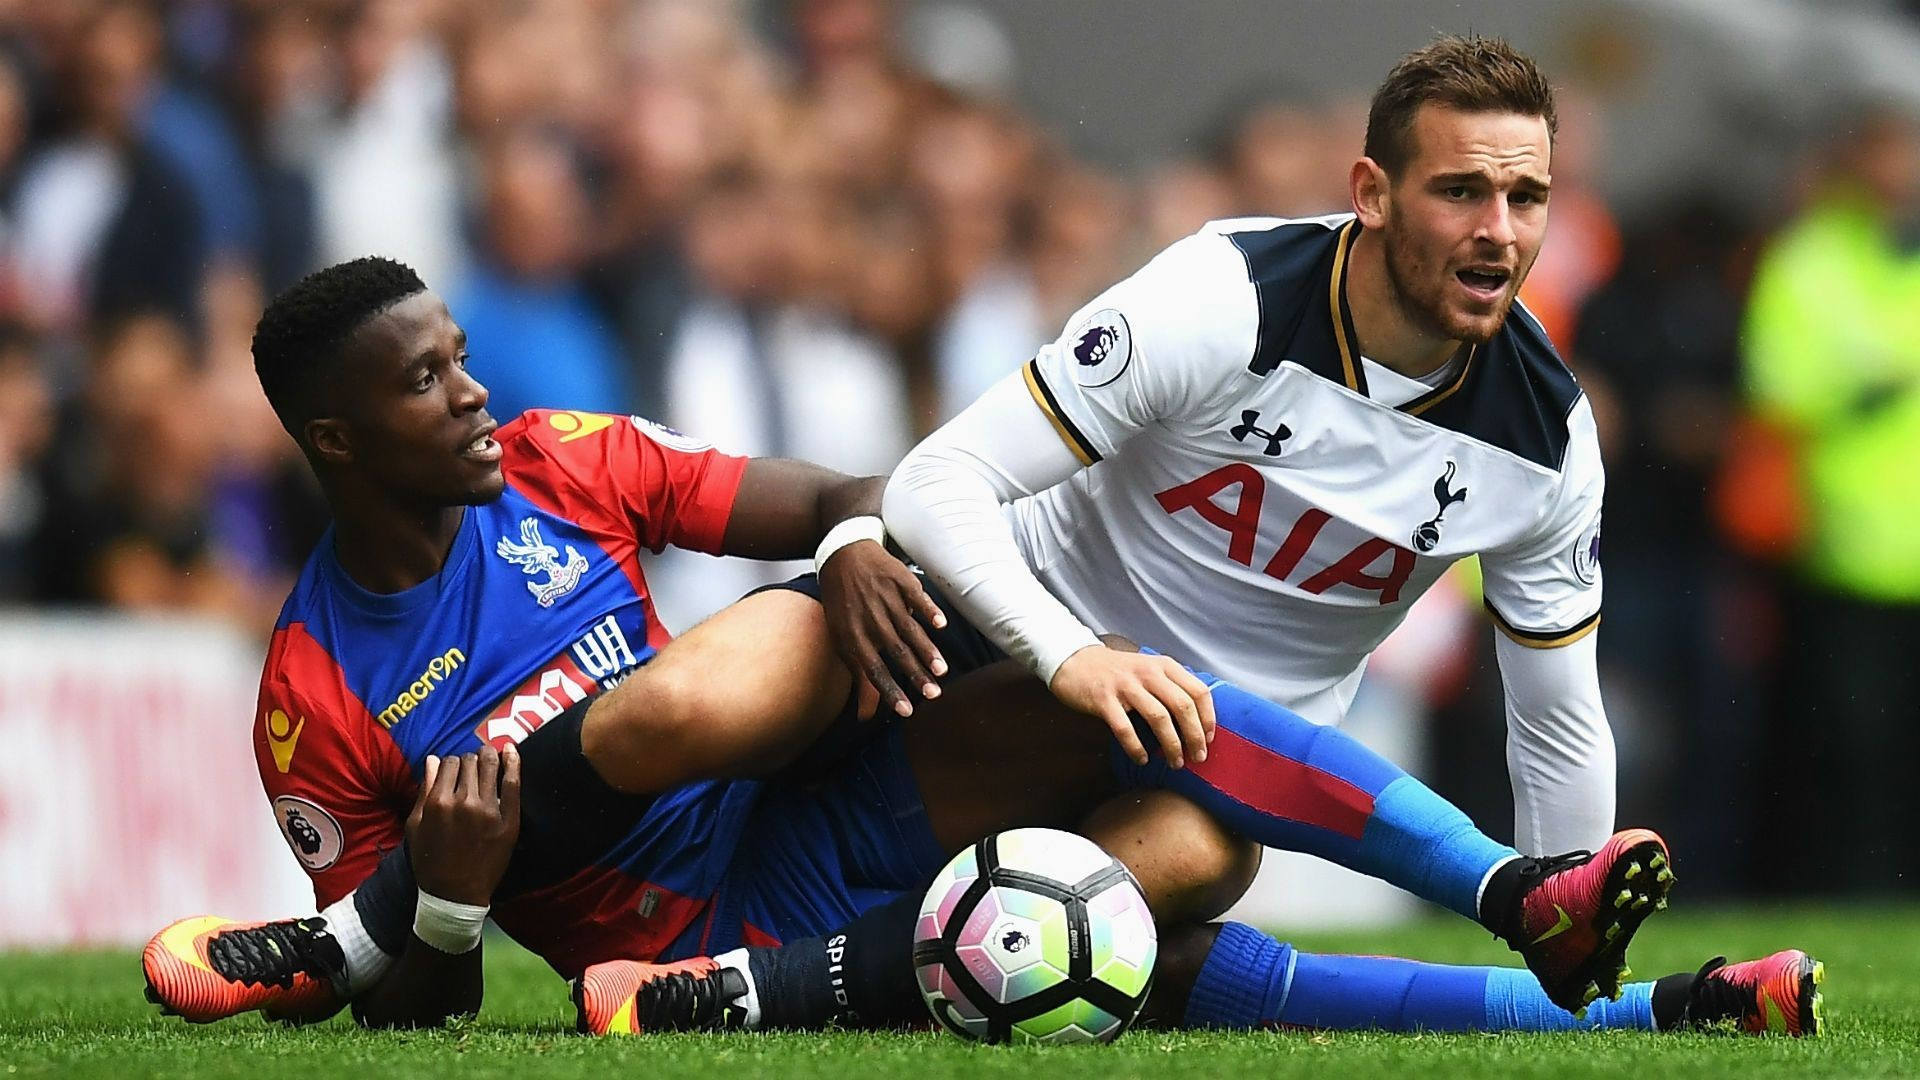 Tottenham Hotspur Wallpaper for Kindle (72+ images)